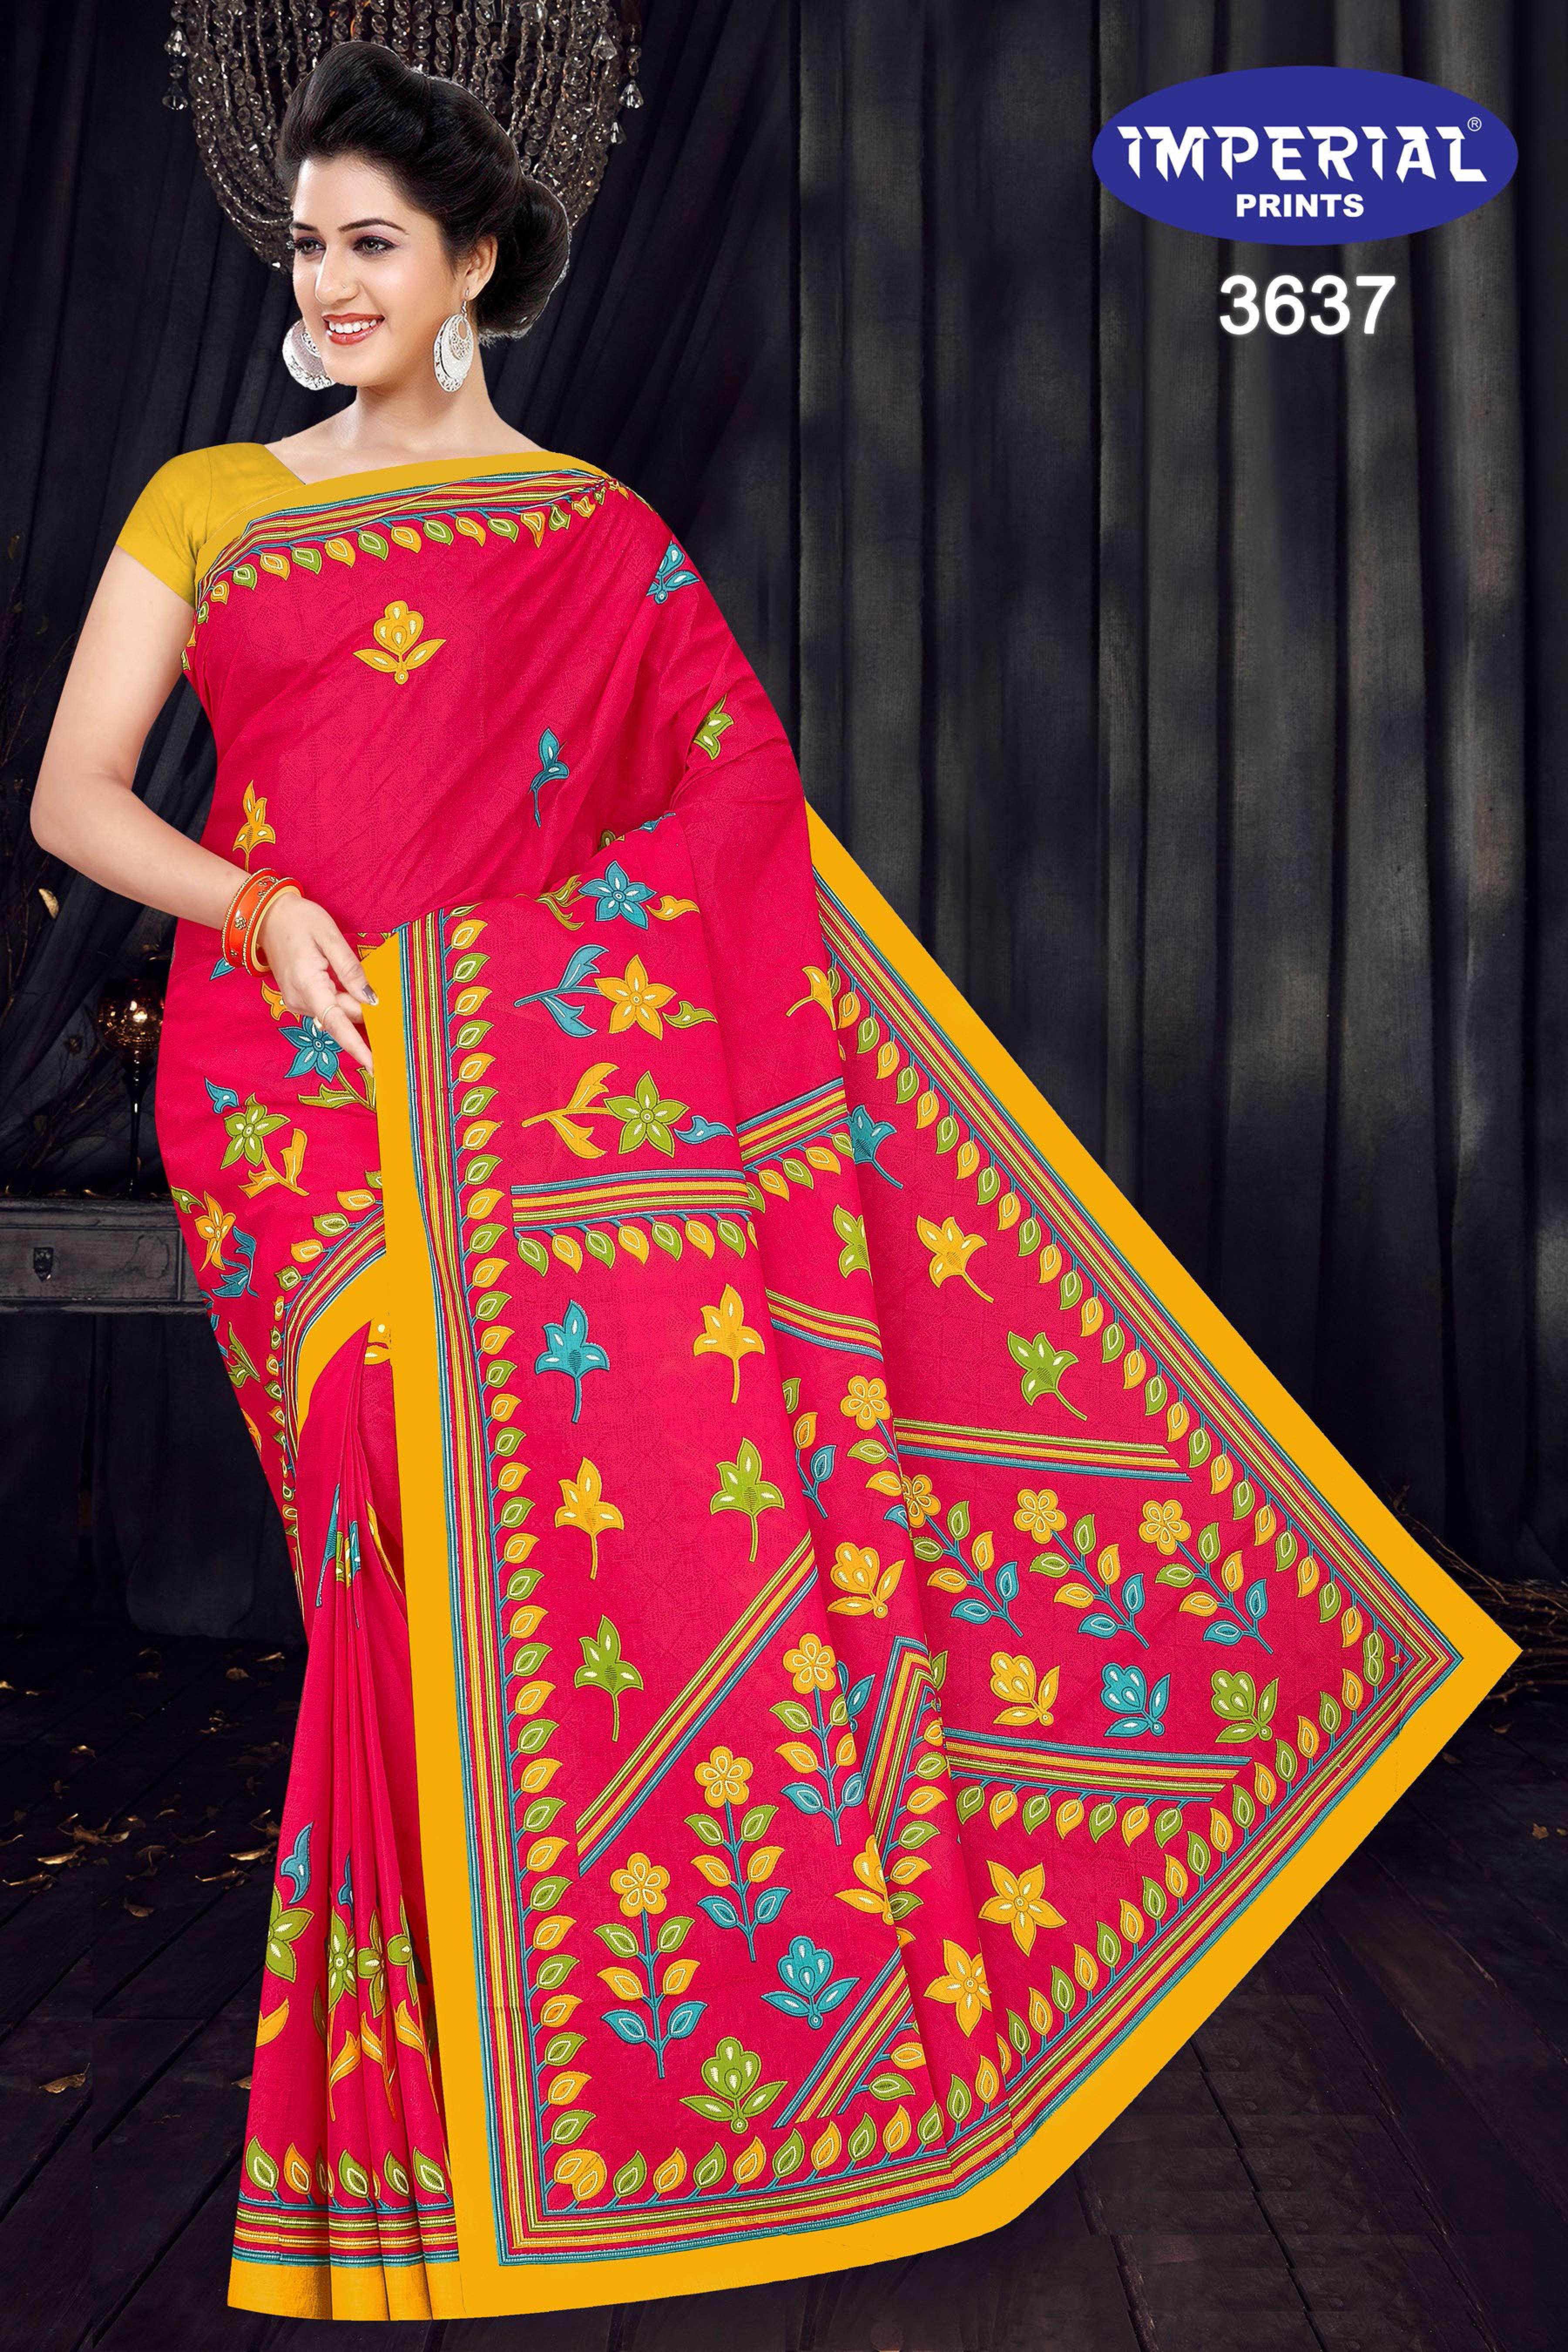 Imperial Mari Gold Saree Sari Wholesale Catalog 15 Pcs 8 - Imperial Mari Gold Saree Sari Wholesale Catalog 15 Pcs